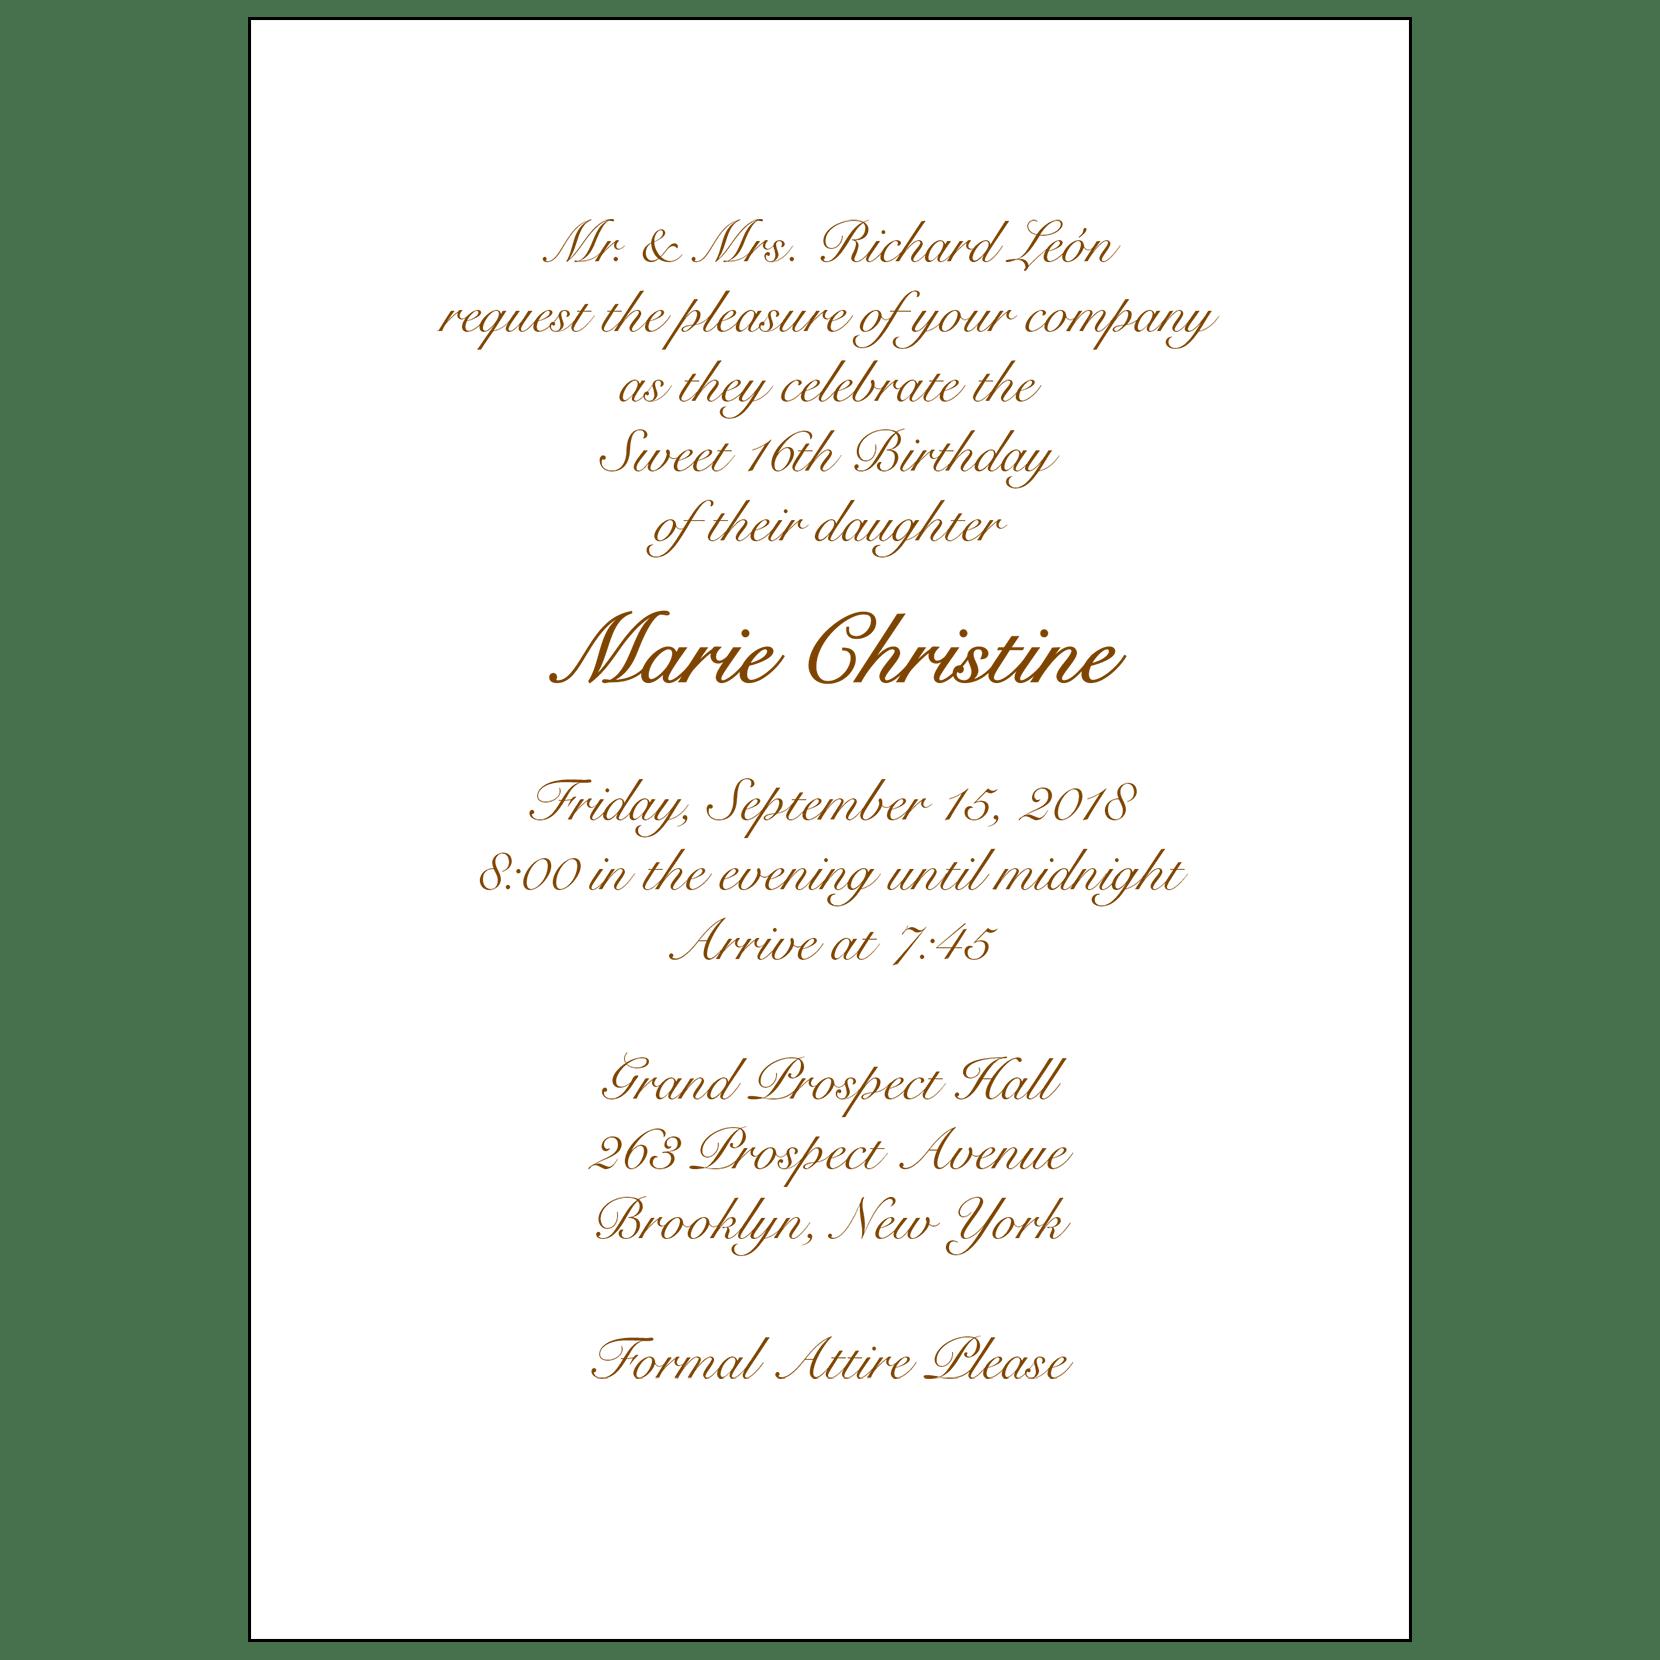 sweet sixteen invitation style 1 sample a